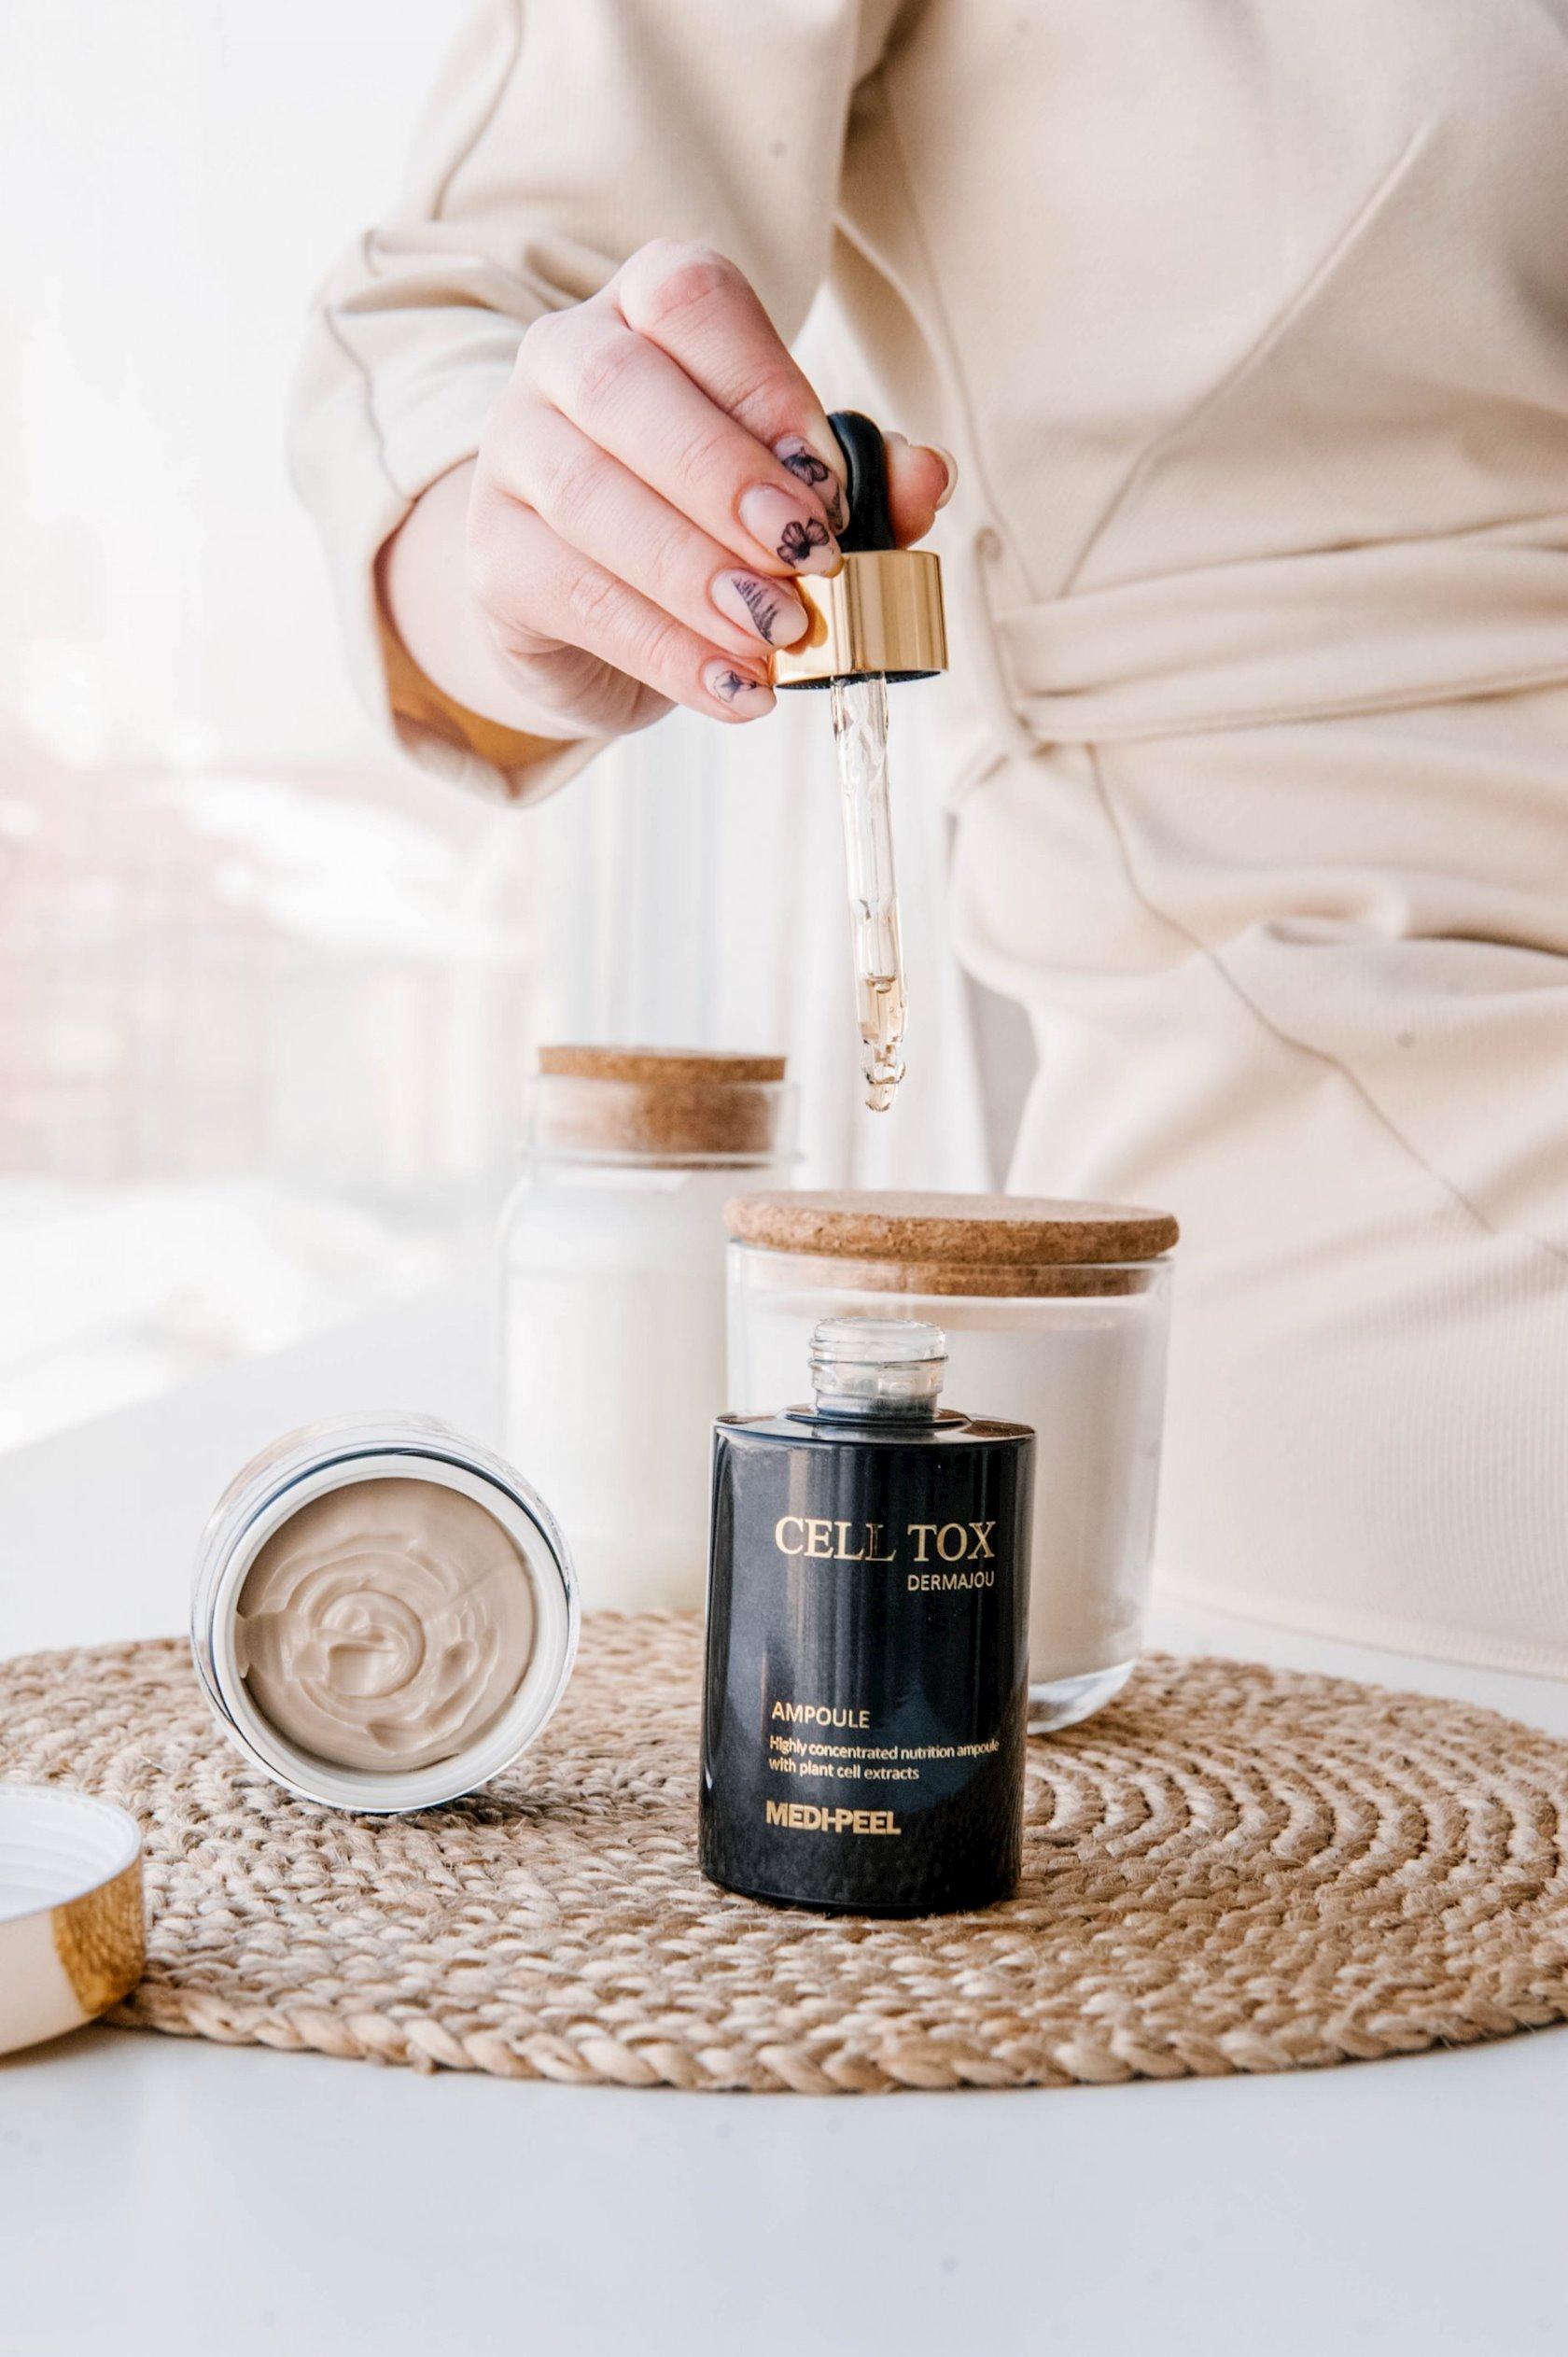 Üz üçün kök hüceyrəli serum Medi Peel Cell Tox Dermajou Ampoule 100 ml